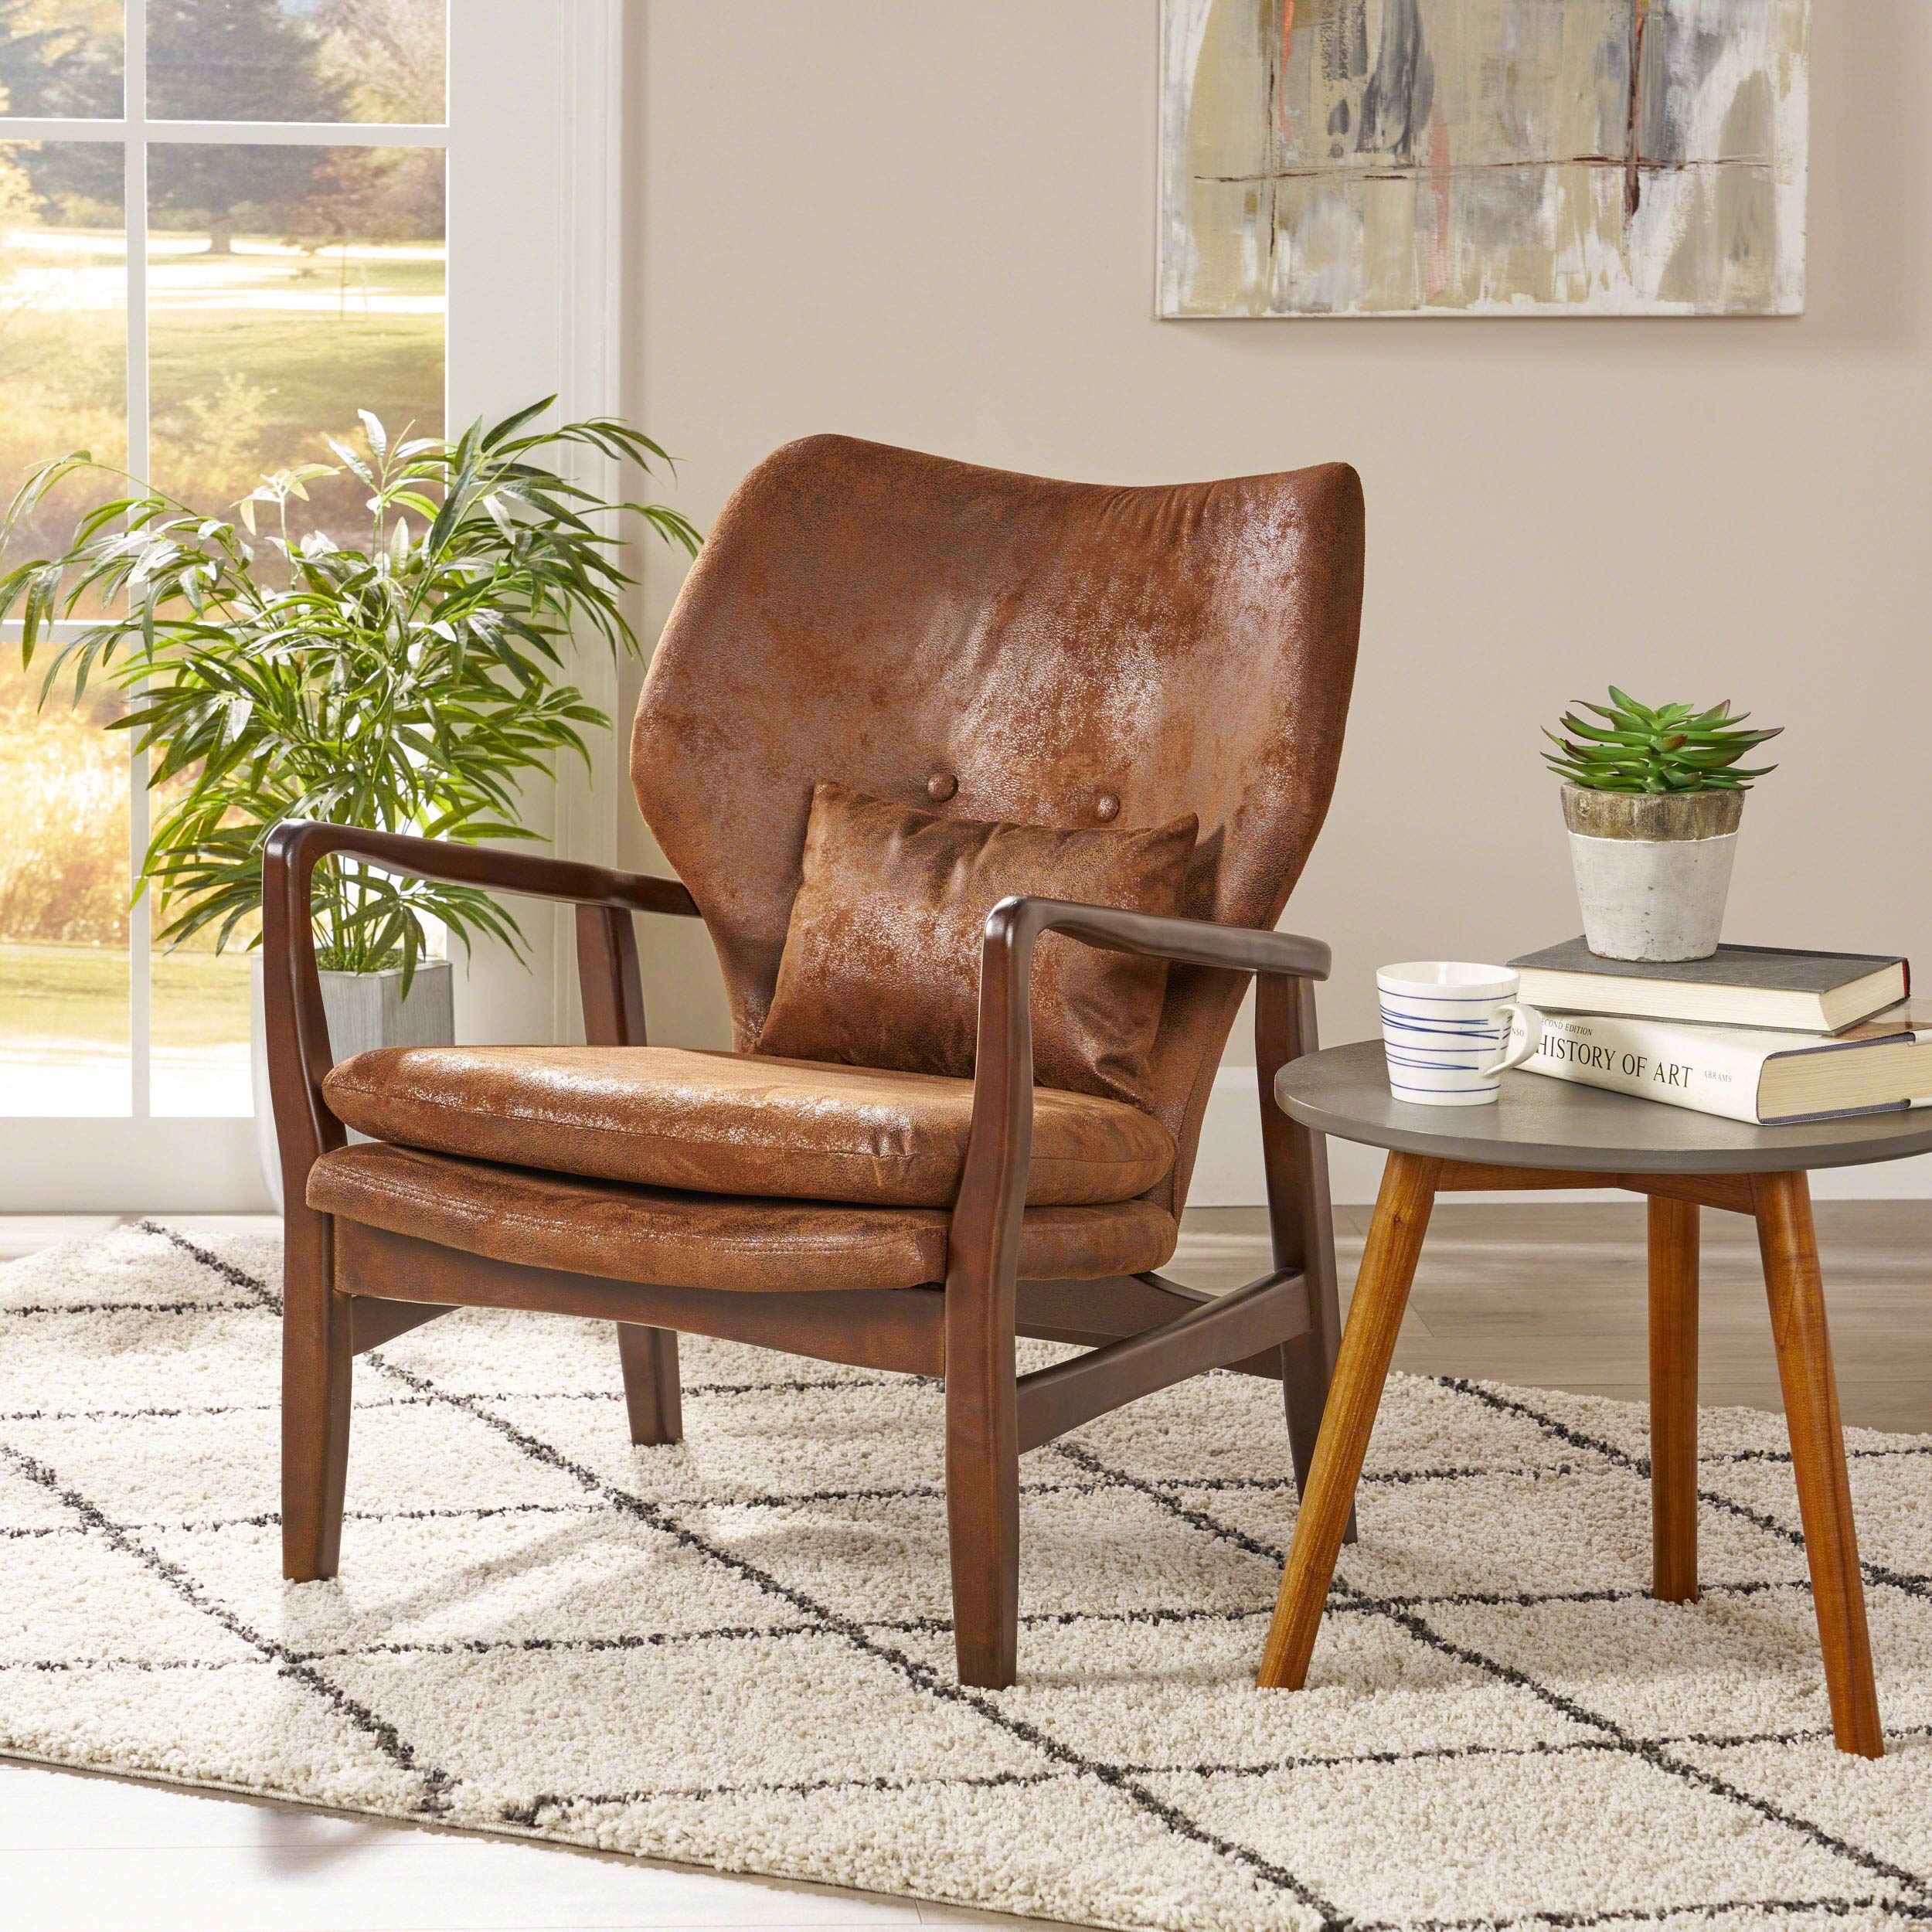 Christopher Knight Home Haddie Mid Century Modern Fabric Club Chair, Brown and Dark Espresso by Christopher Knight Home